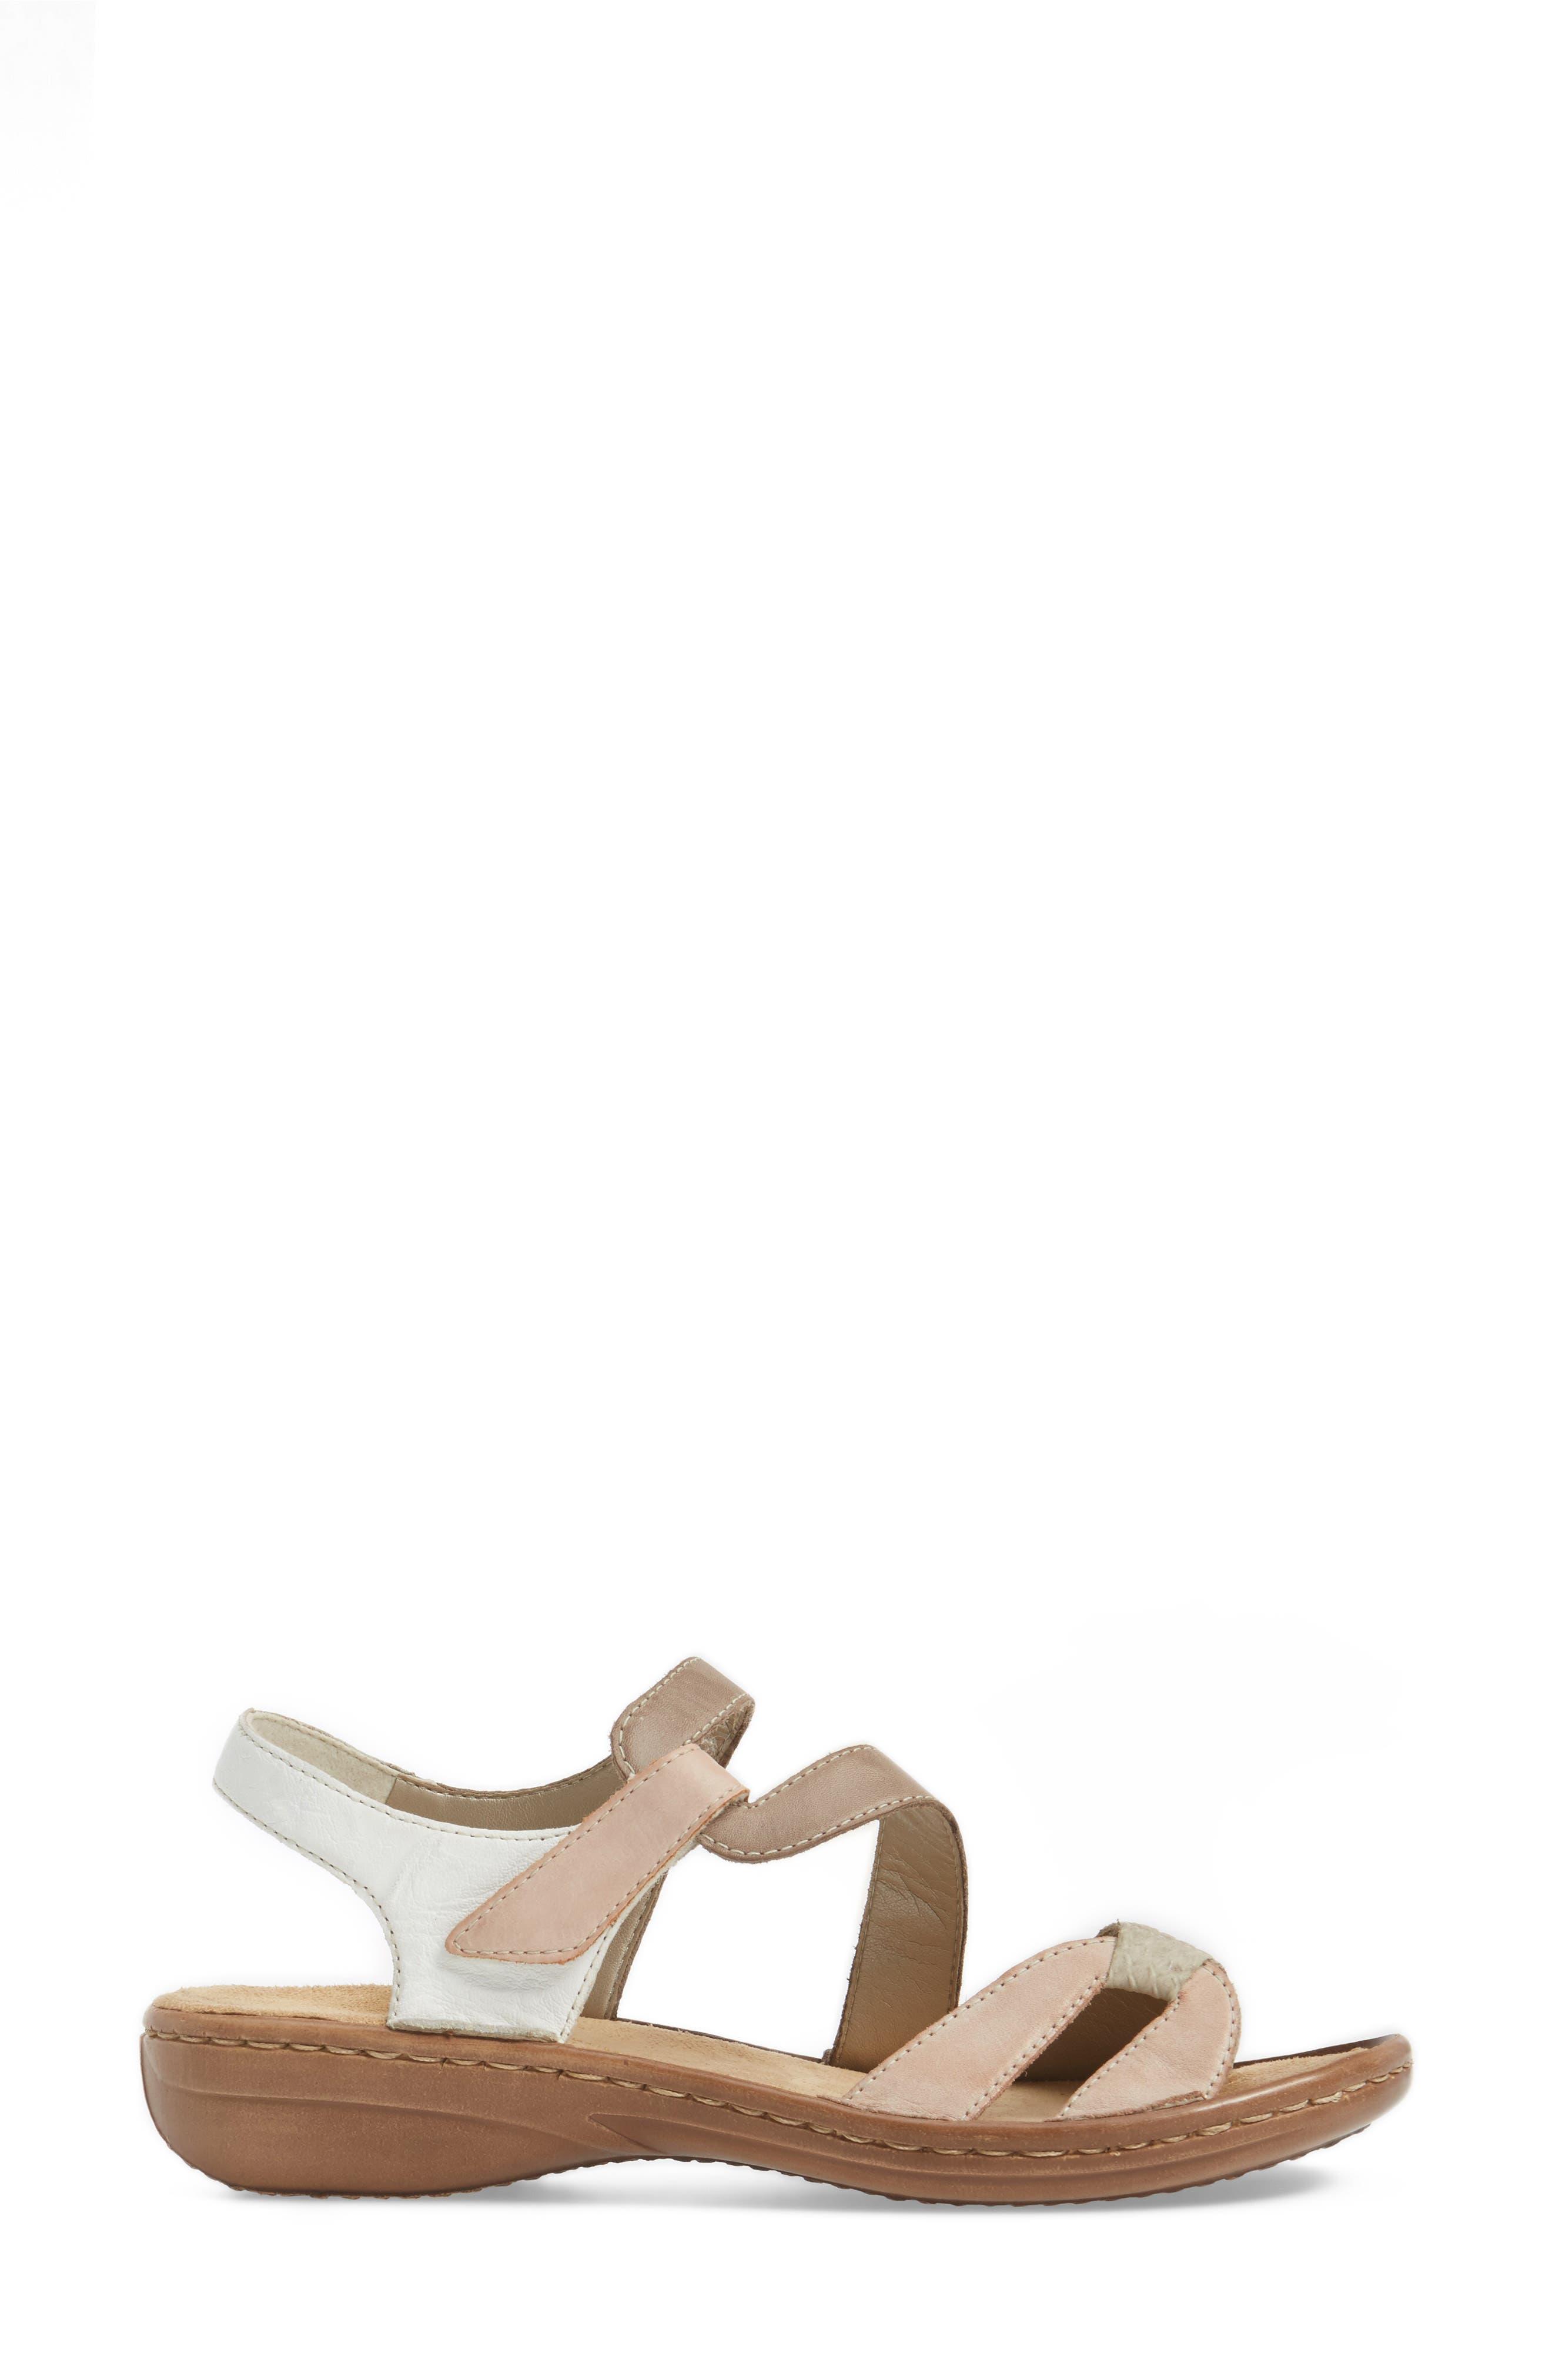 Regina 66 Wedge Sandal,                             Alternate thumbnail 3, color,                             ROSE LEATHER